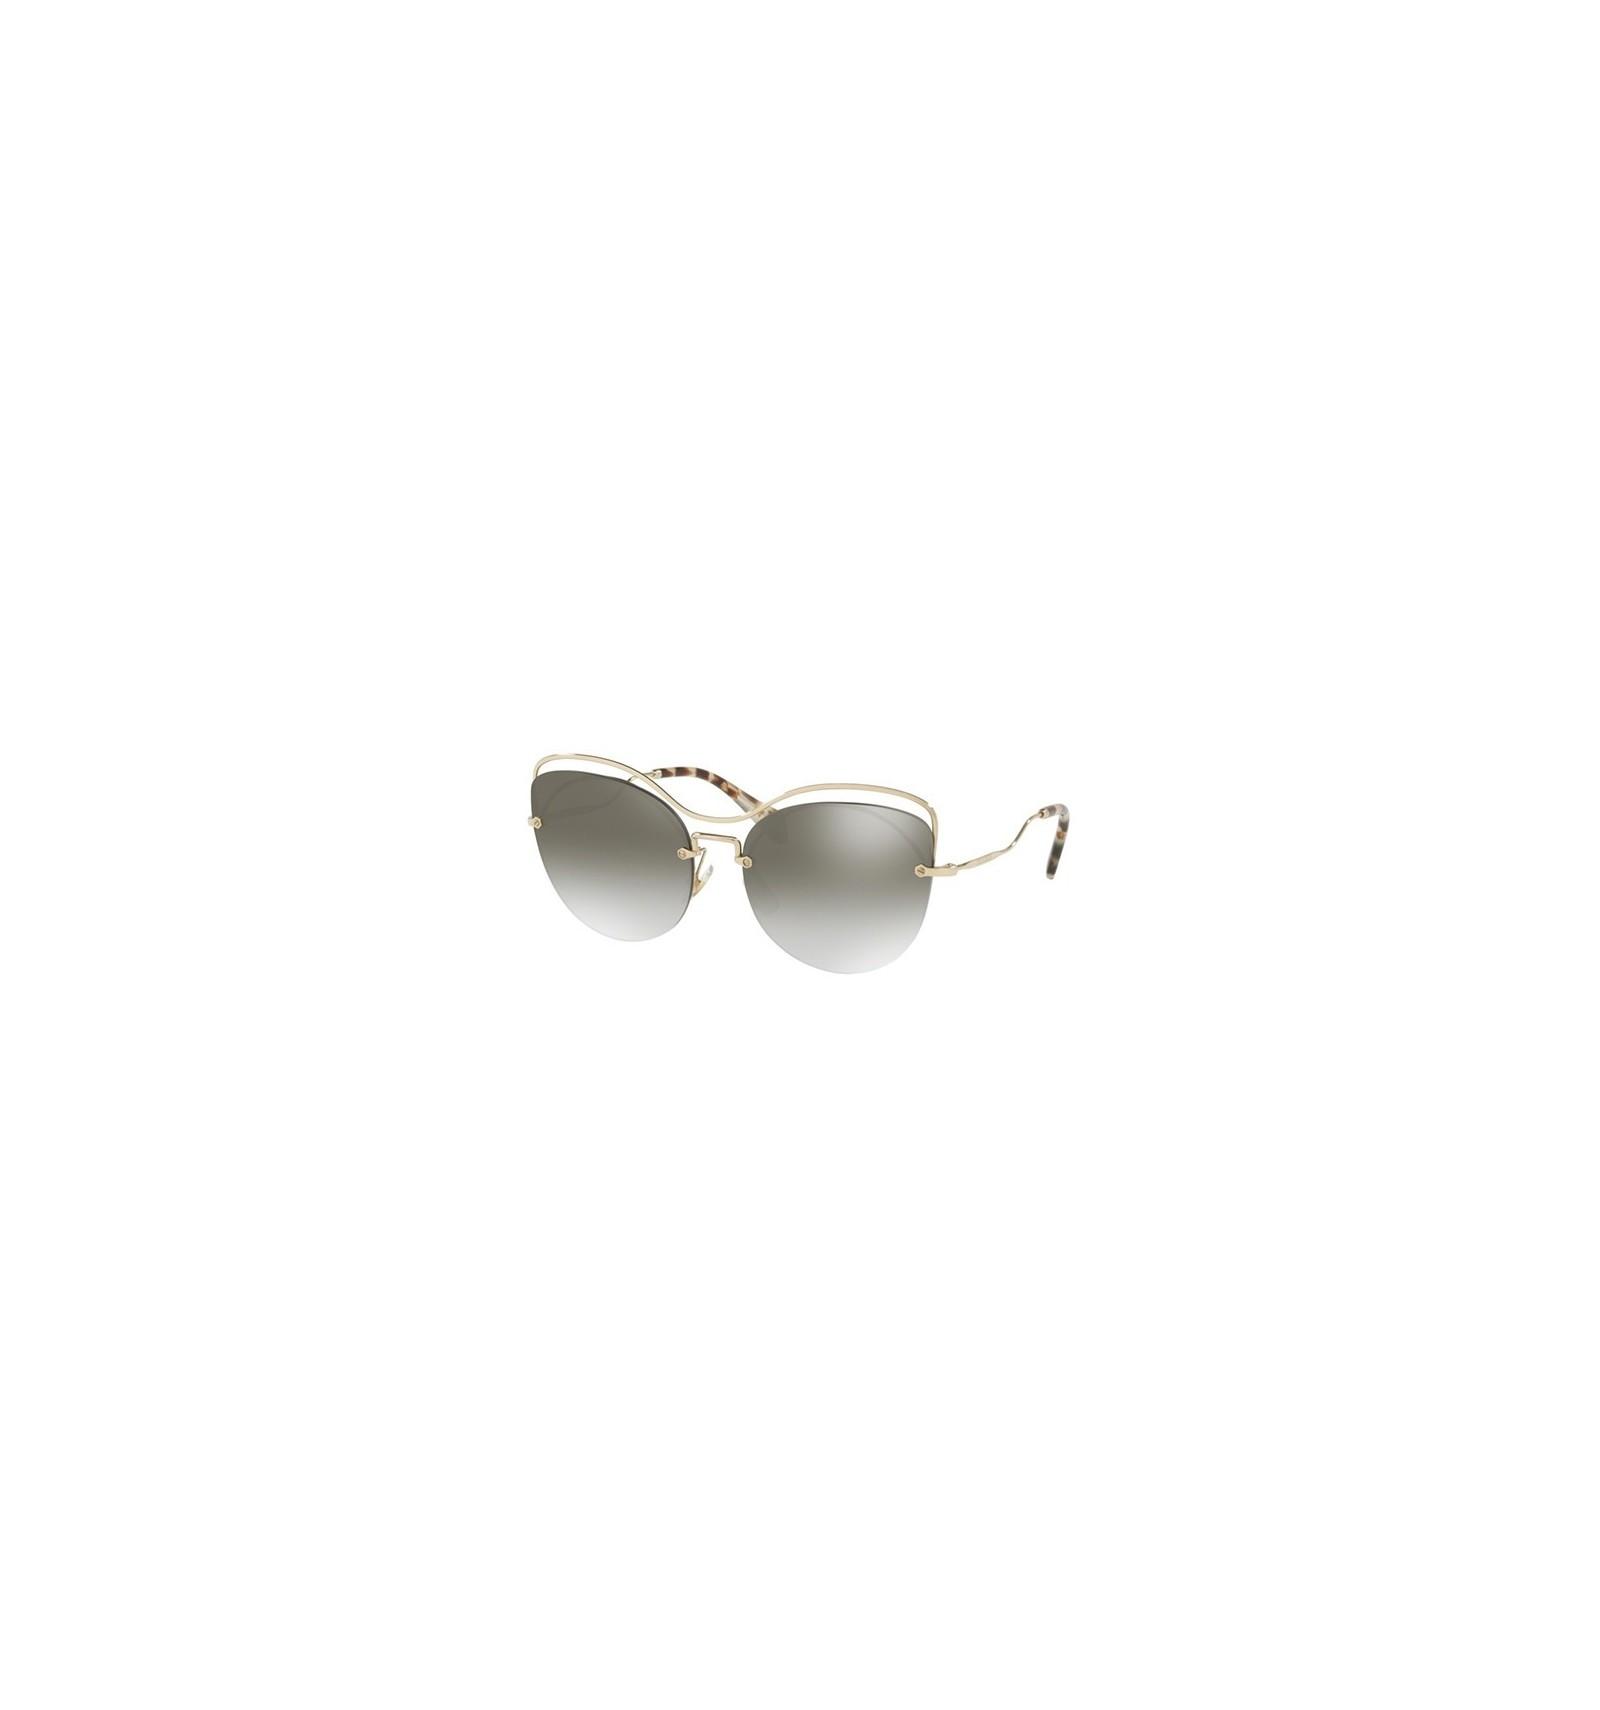 c19d169459 Gafas de sol MIU MIU SMU50TS SCENIQUE EVOLUTION Pale Gold - Grey Shaded  (ZVN-